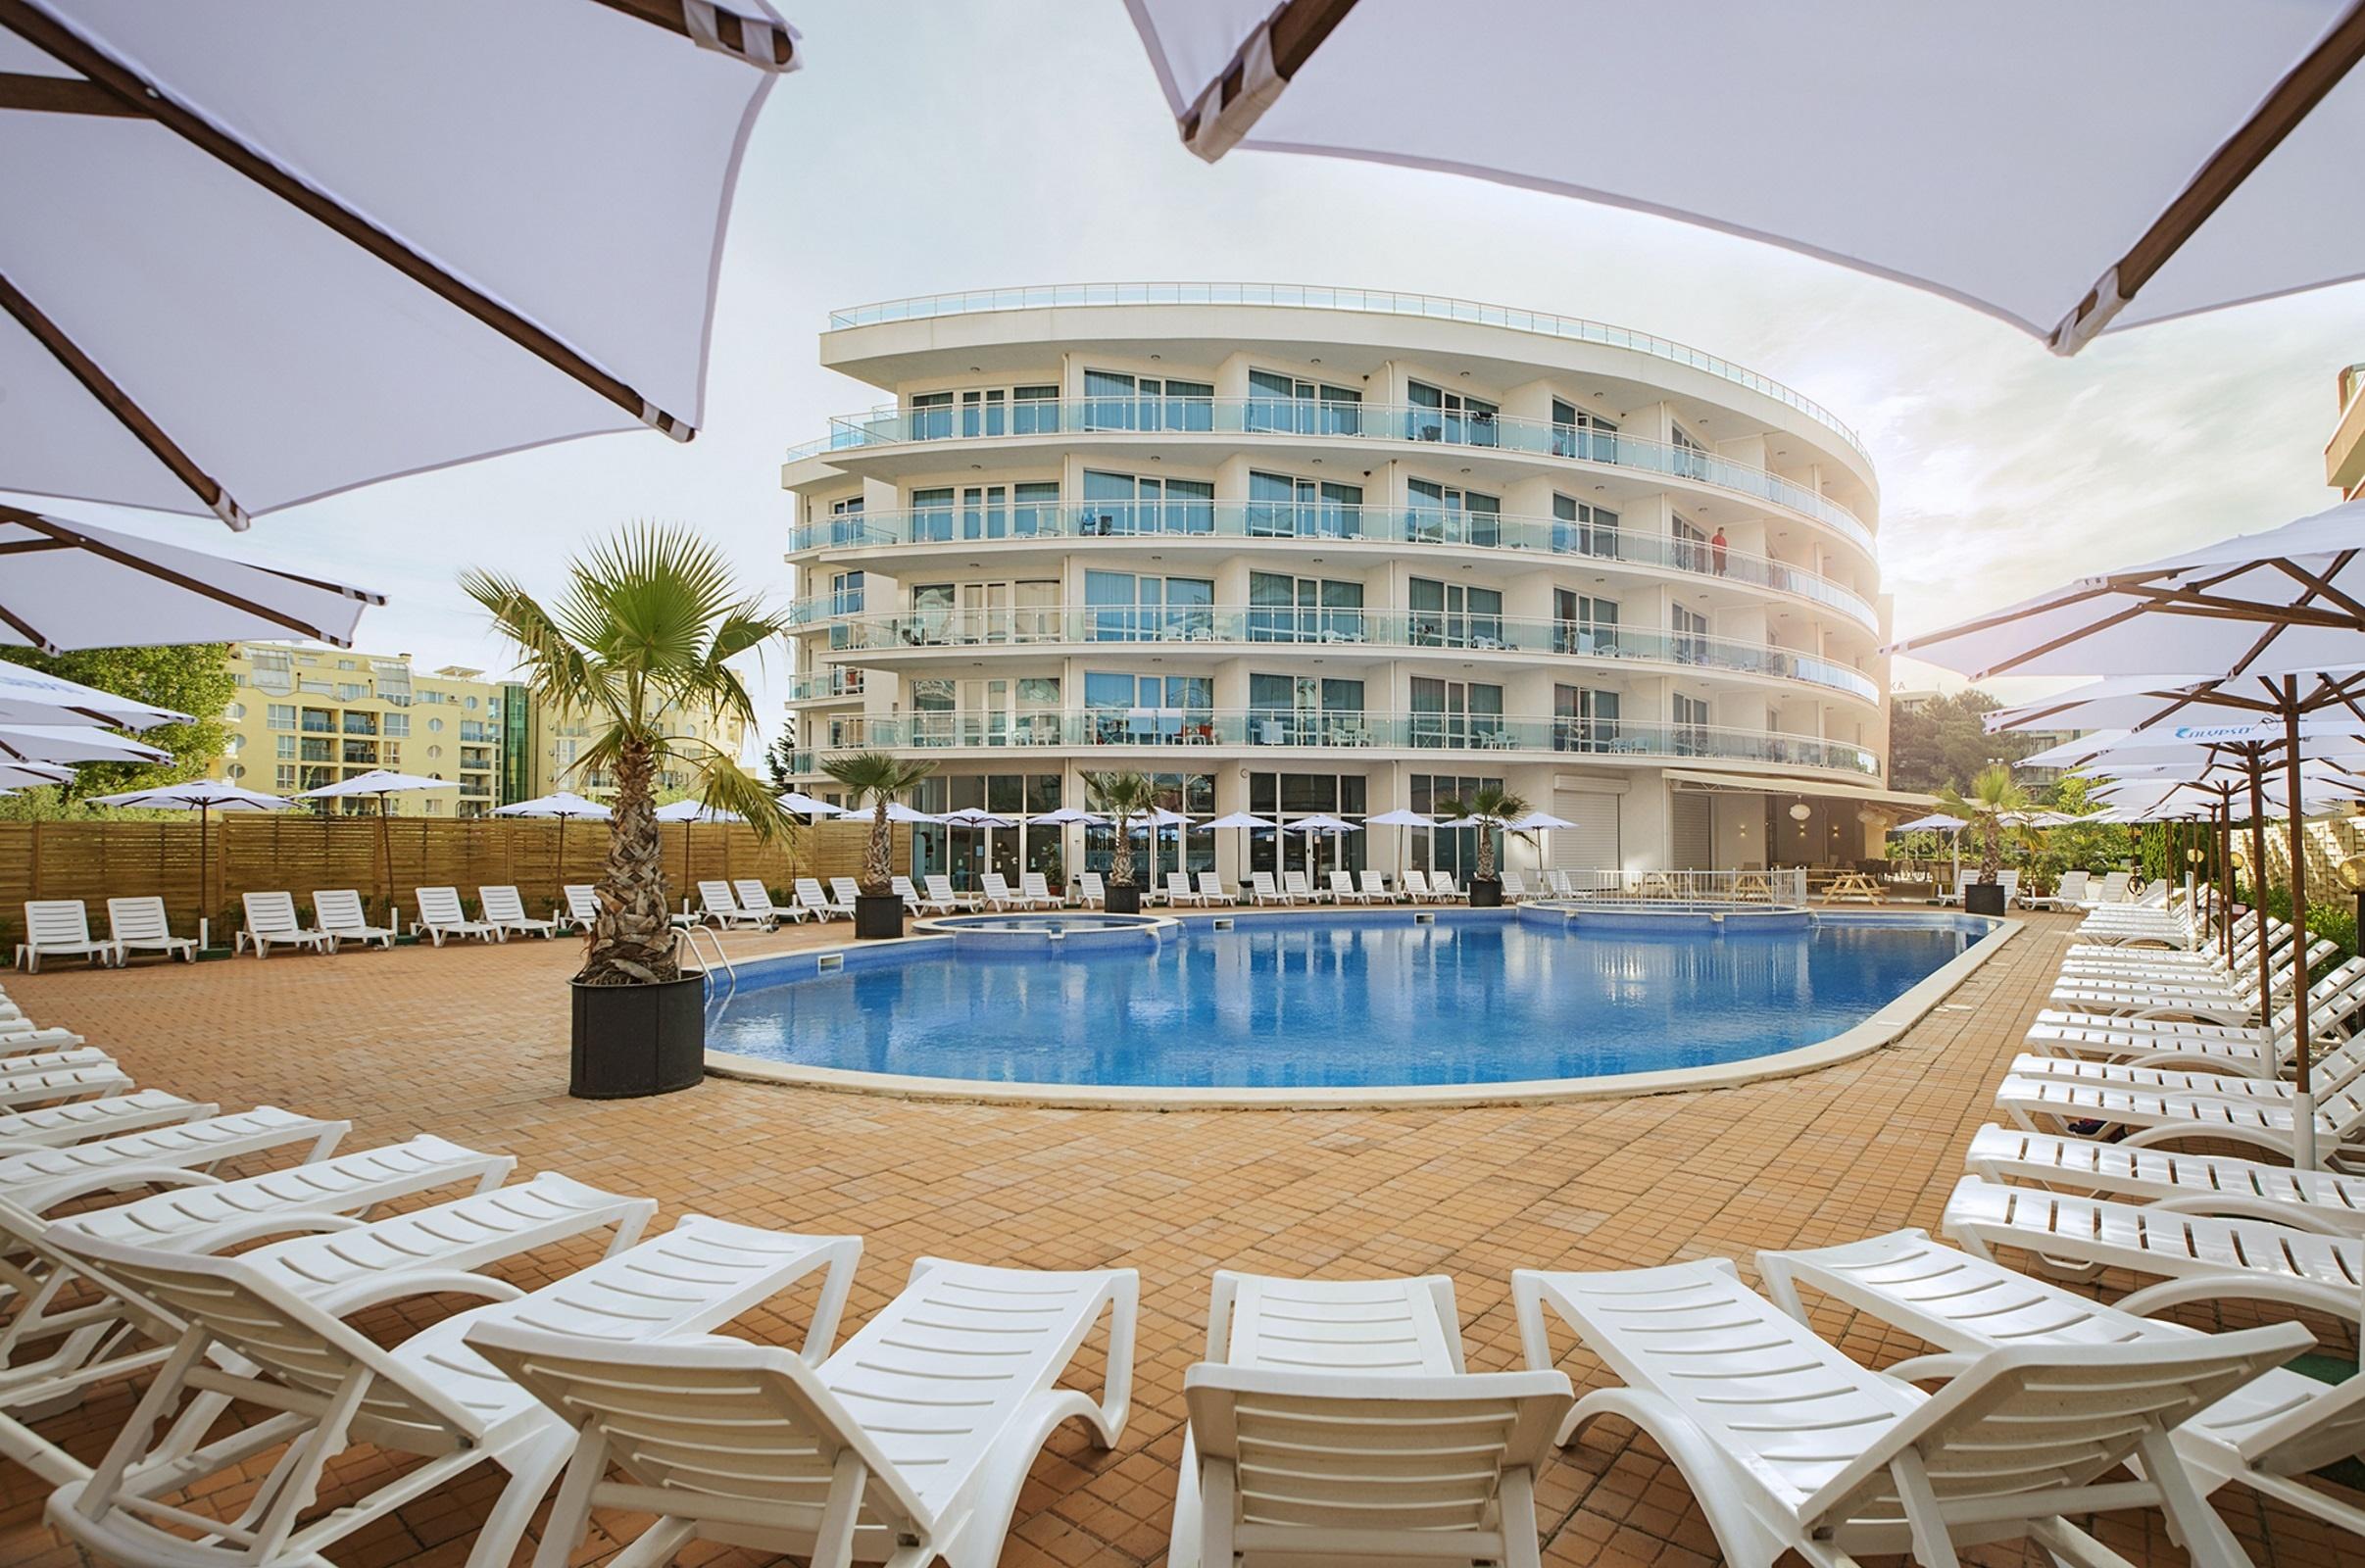 All Inclusive Sun Holidays to Calypso Hotel